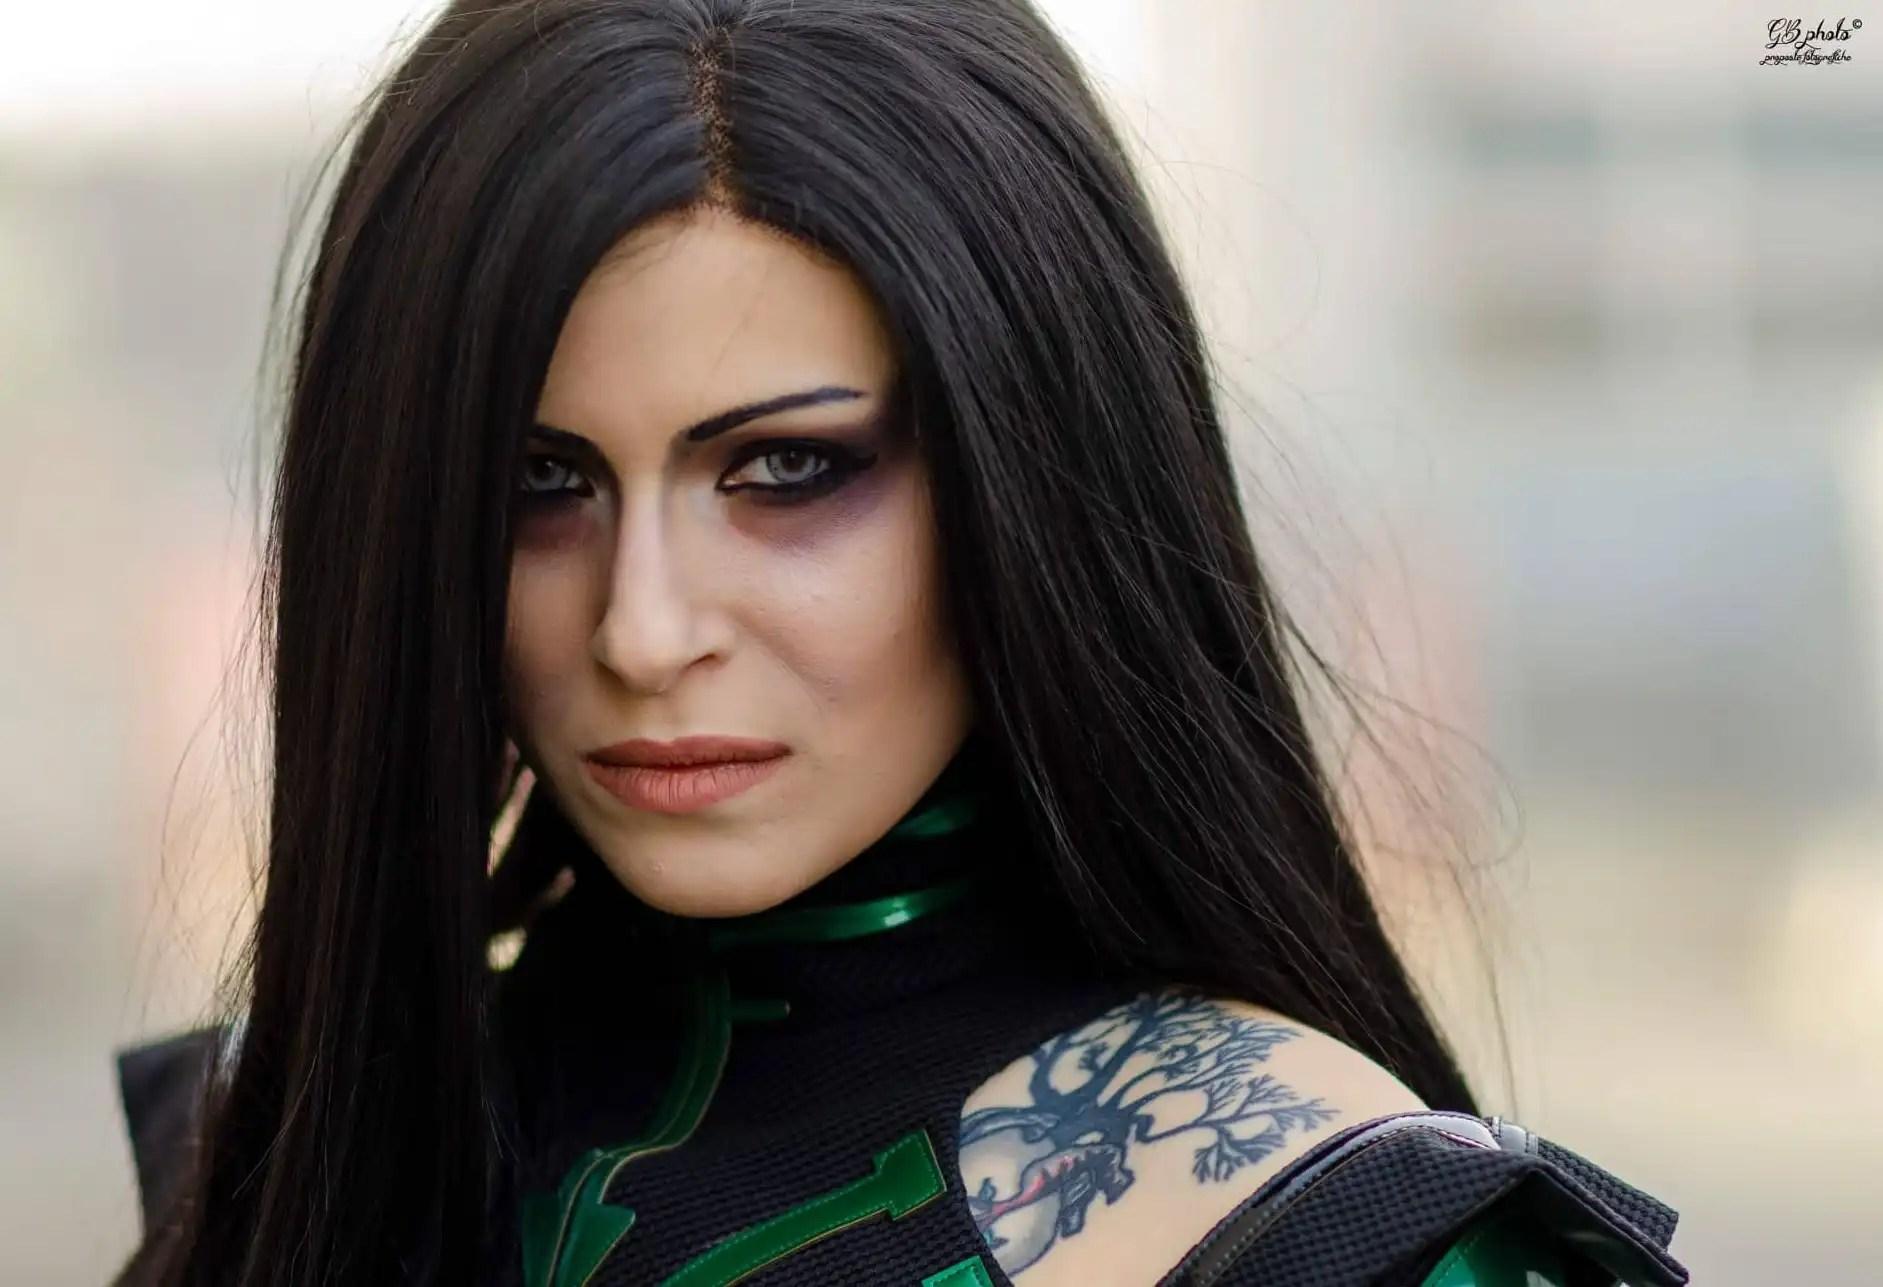 Hela dal film Thor: Ragnarok è interpretata dalla cosplayer Mayra De Luca!